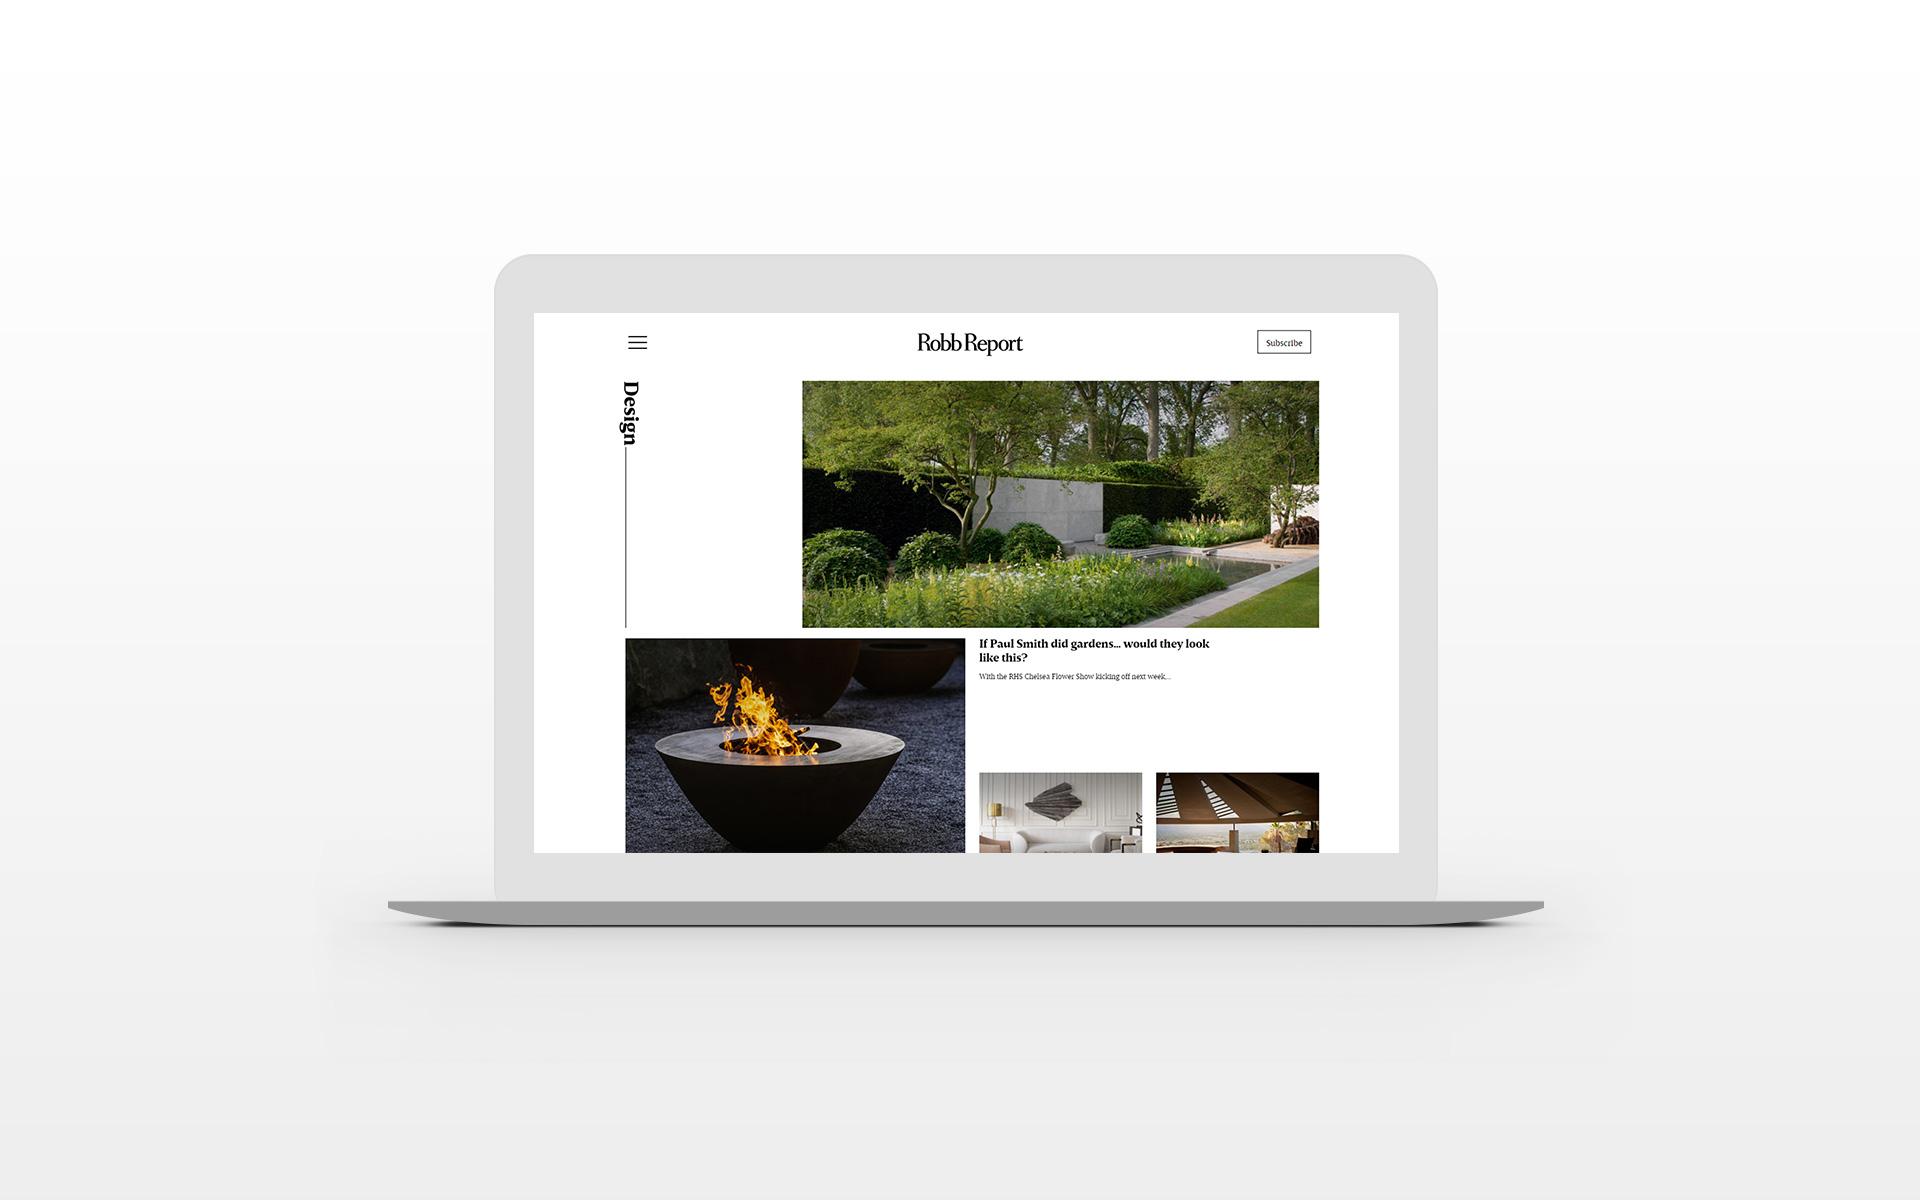 robbreport-gallery-5